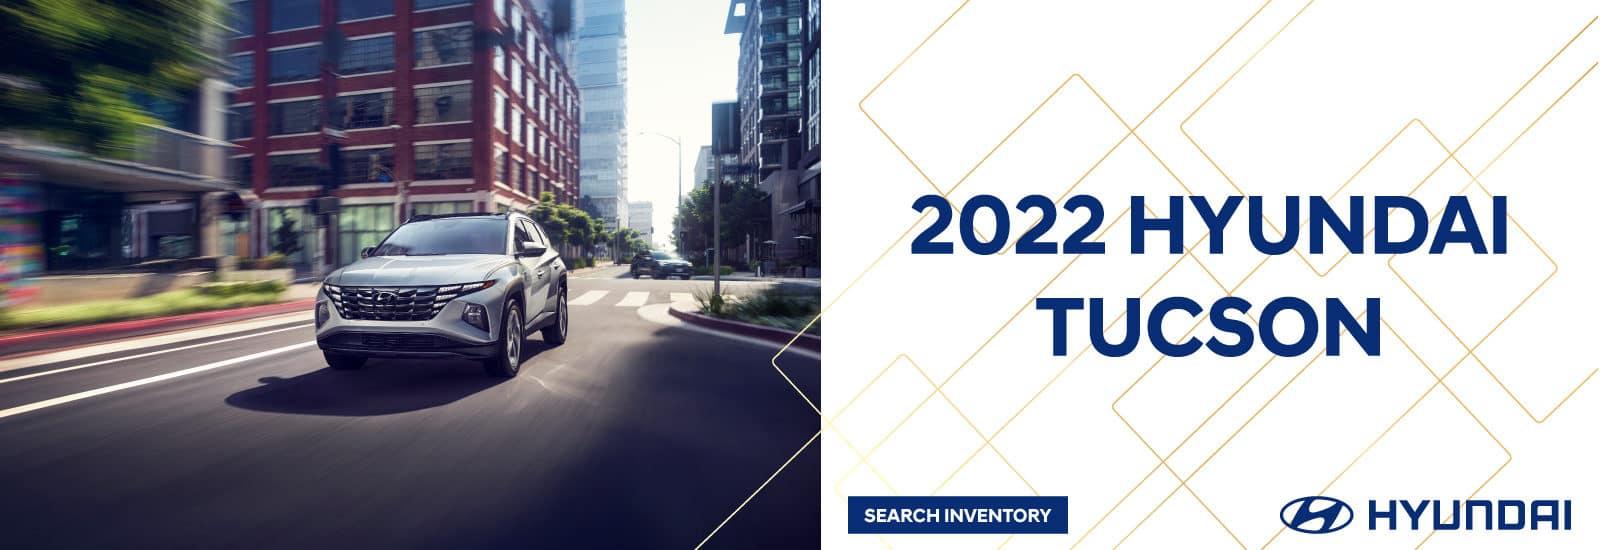 2022-Hyundai-Tucson-Web-Banner-1600x550